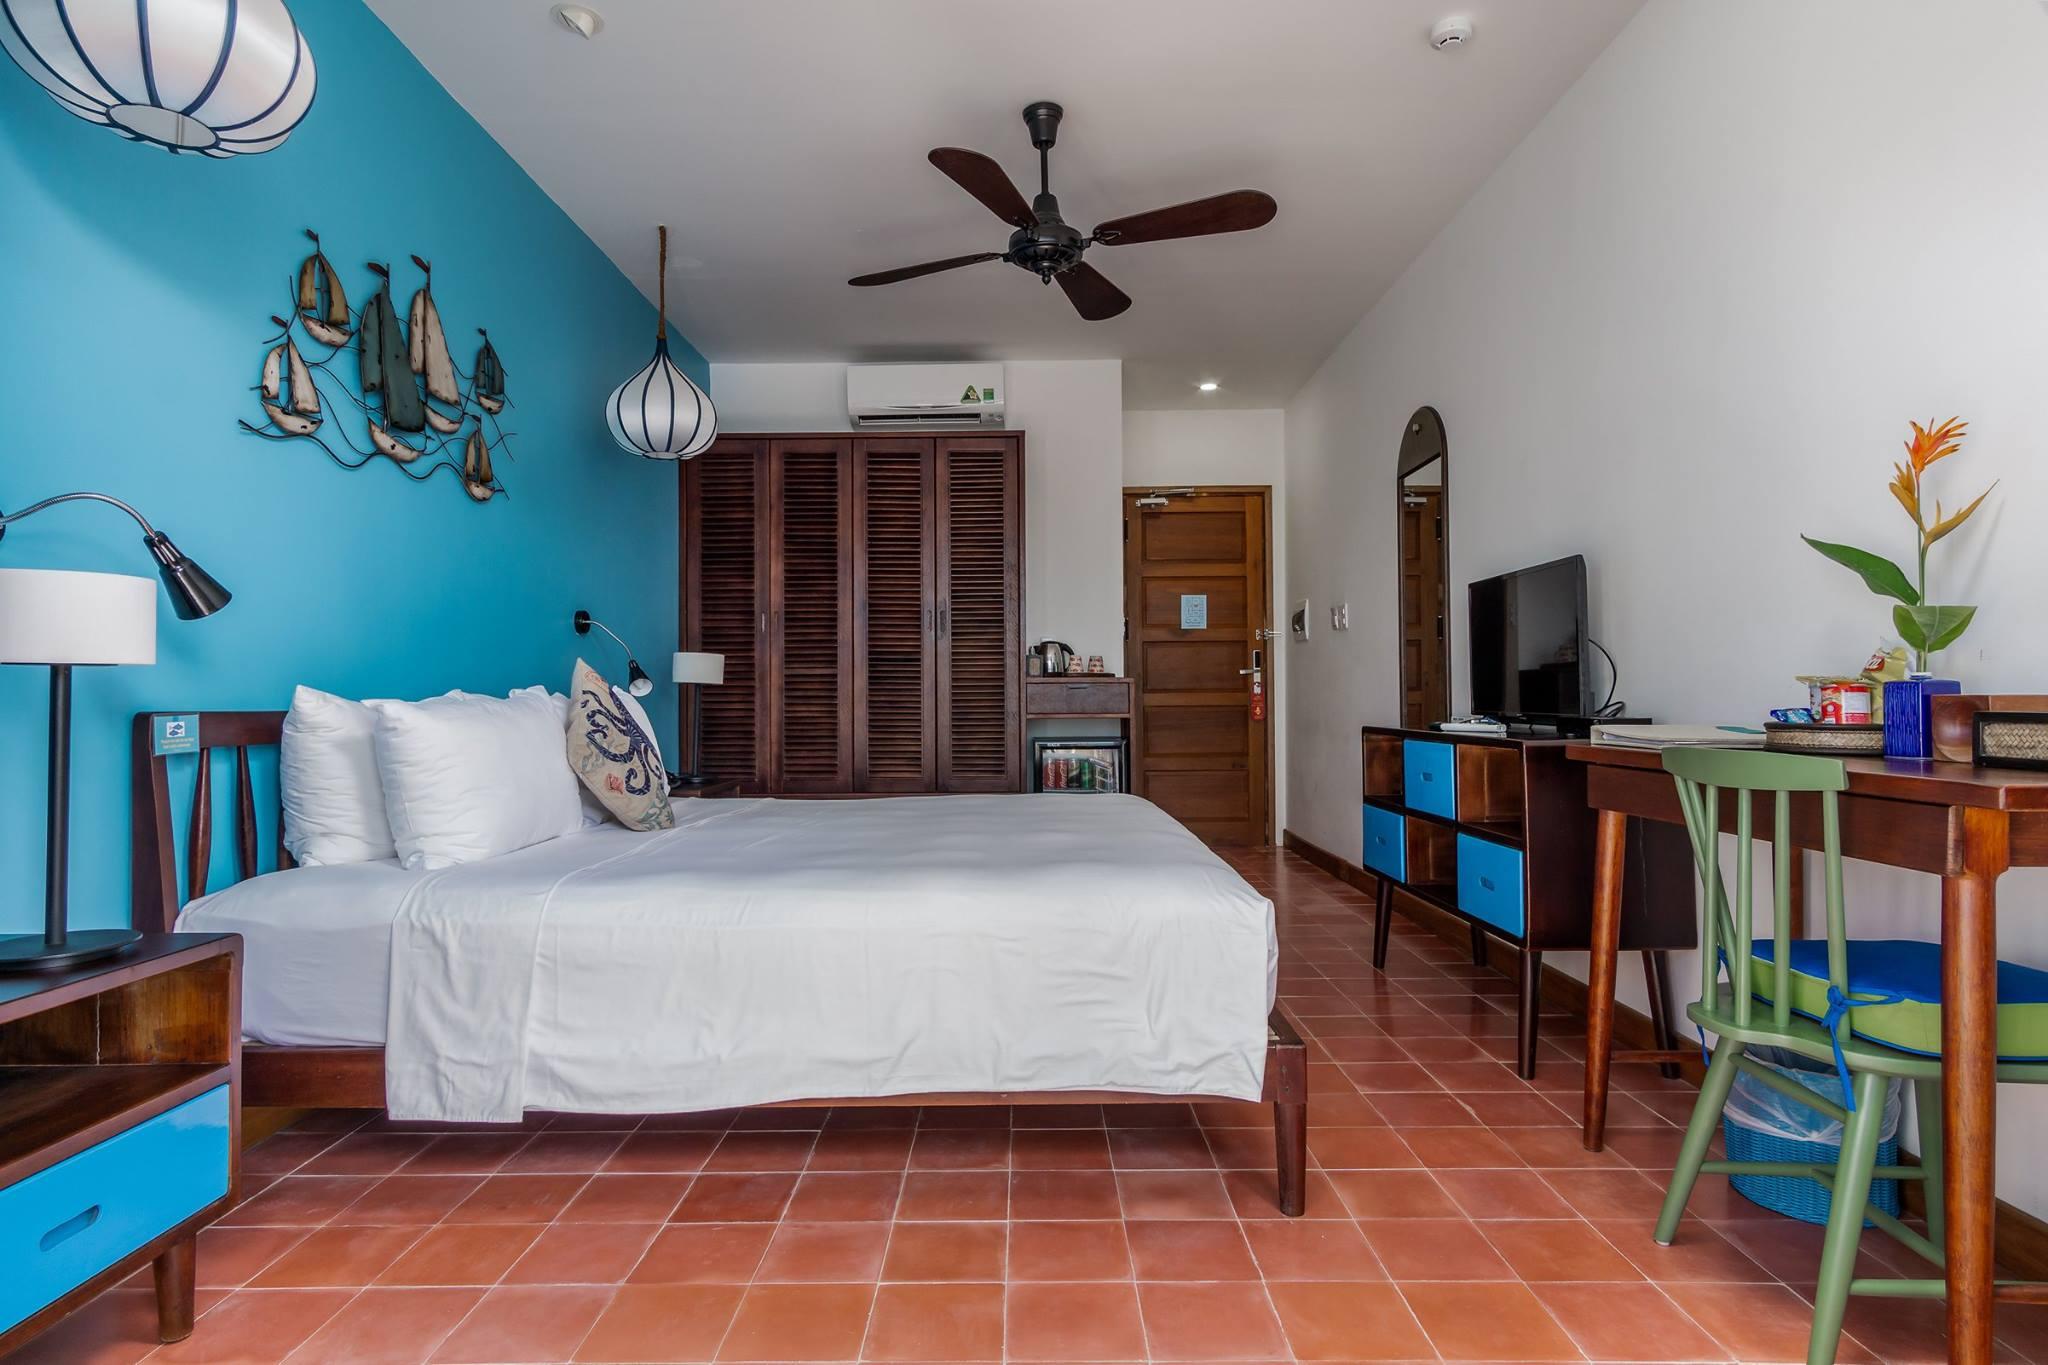 blue Seashell Room at the resort